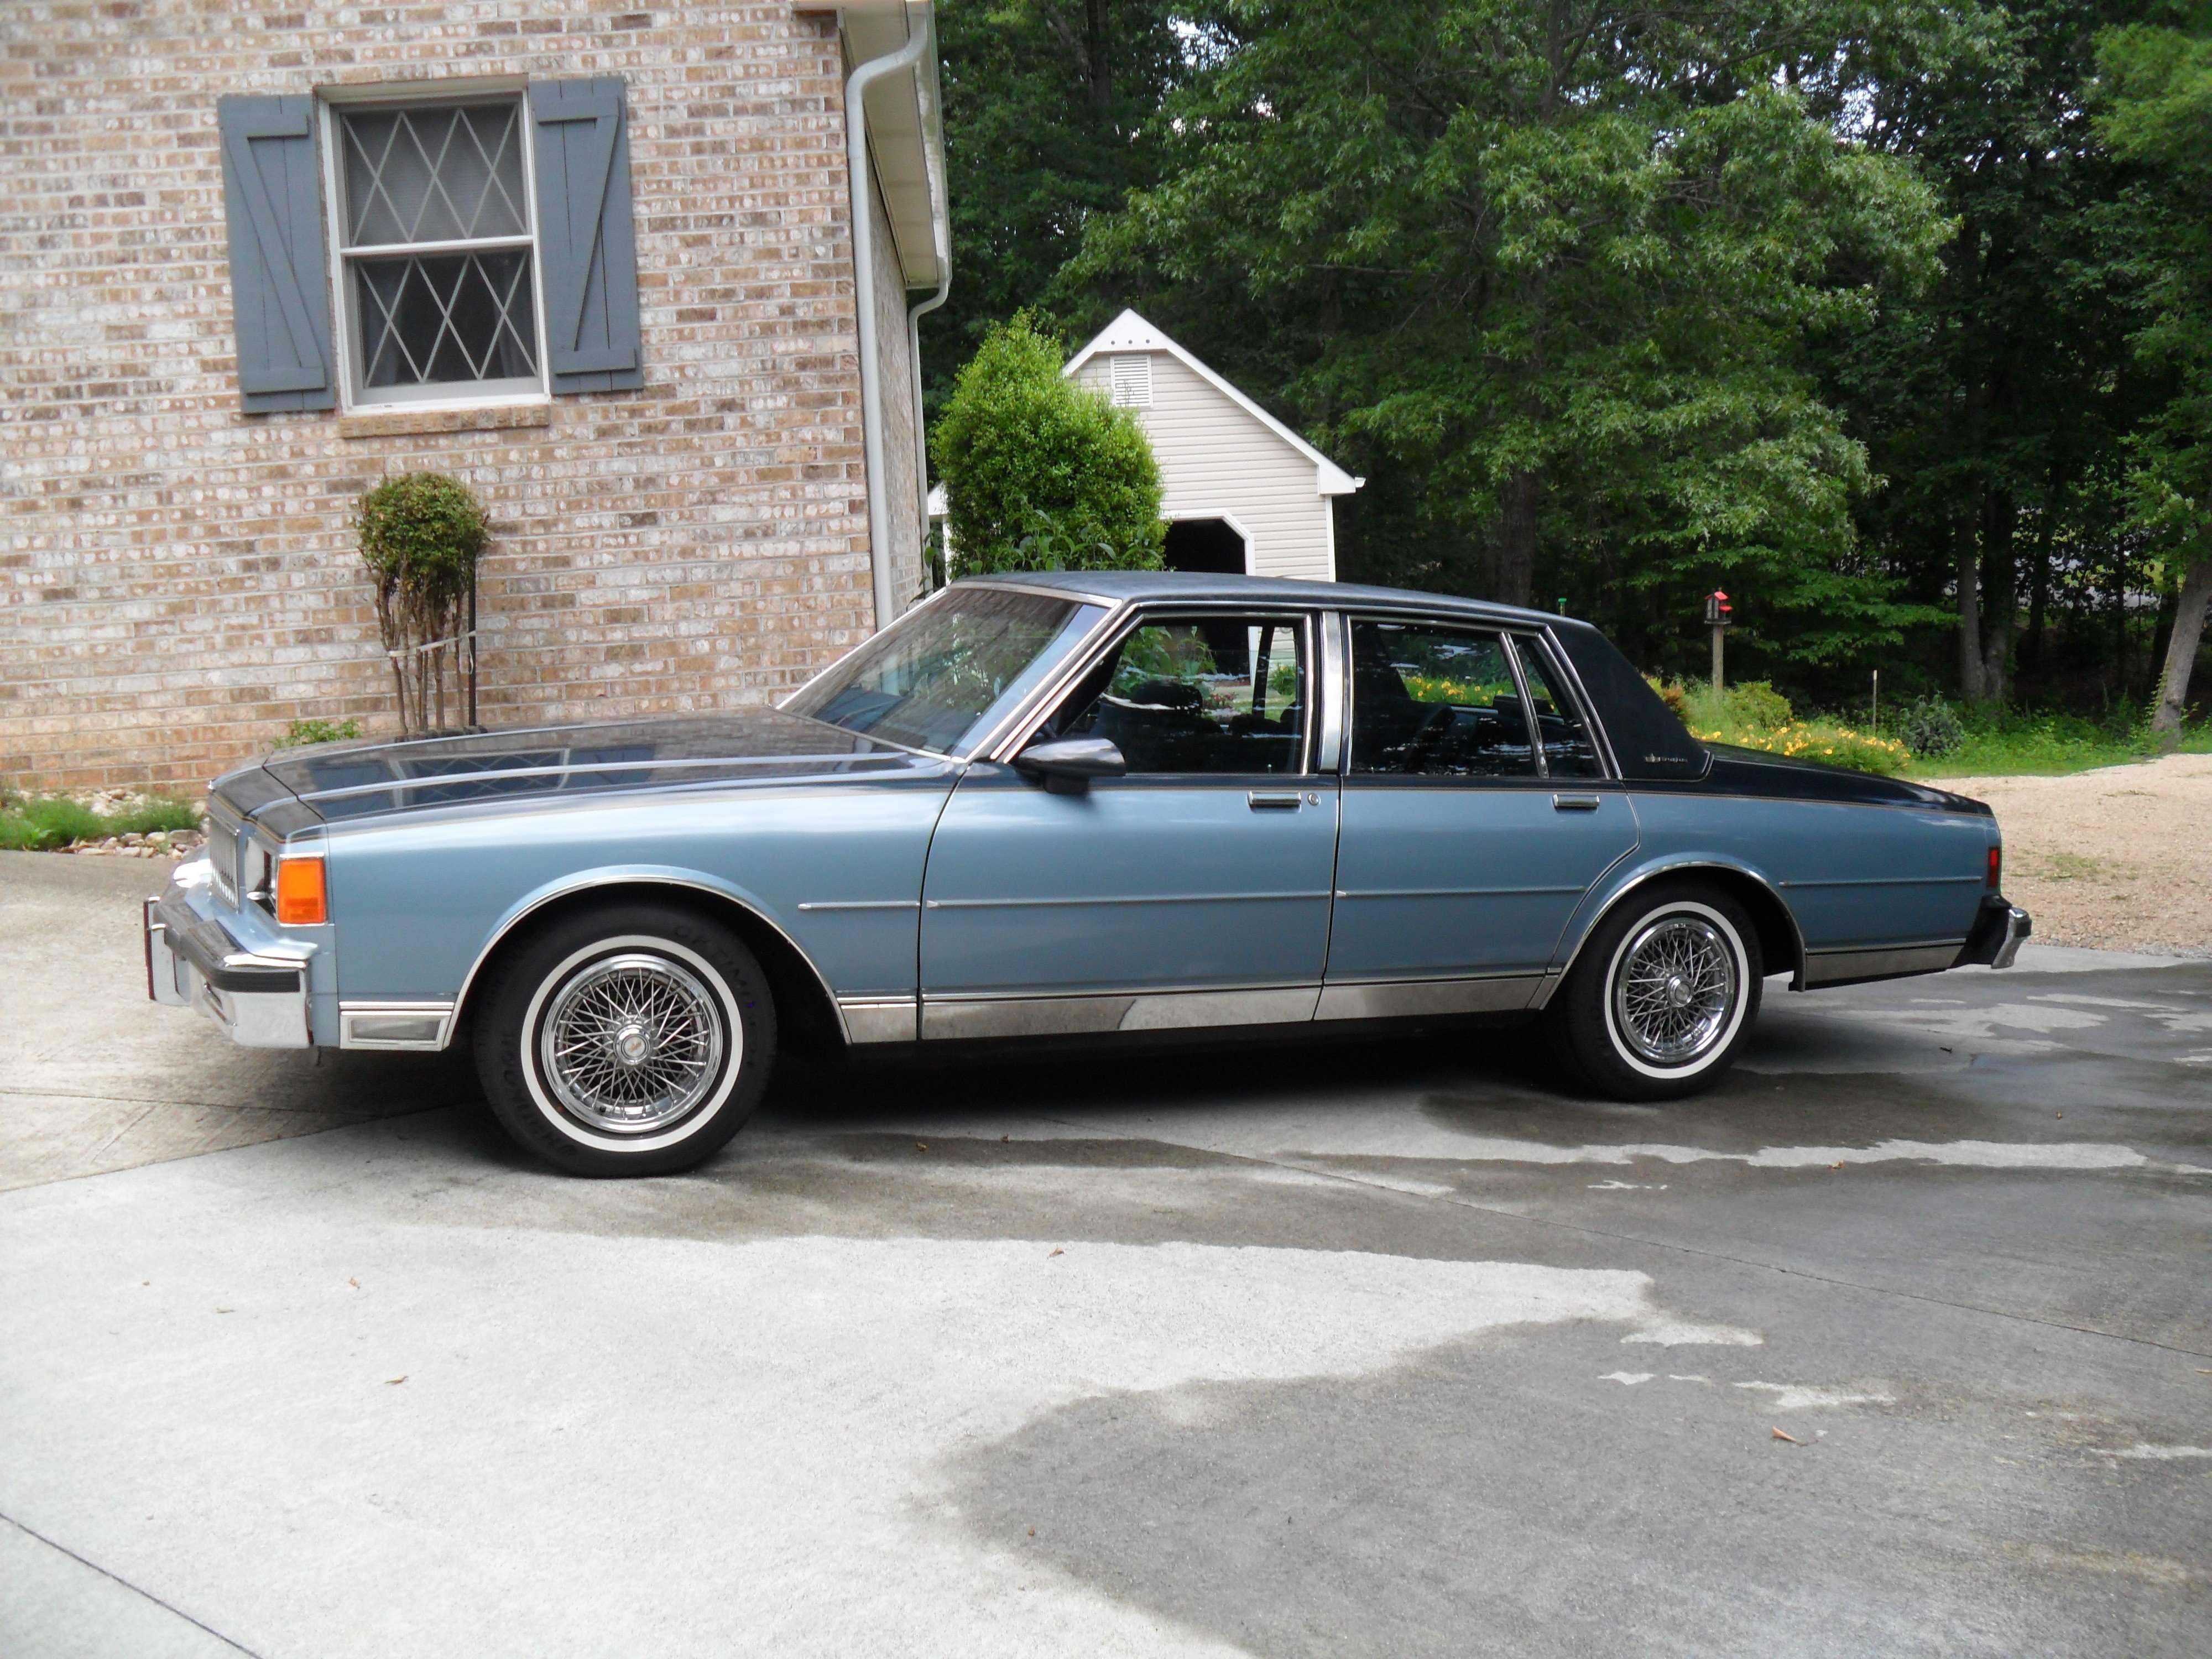 1986 Chevrolet Caprice for sale in Appomattox, VA